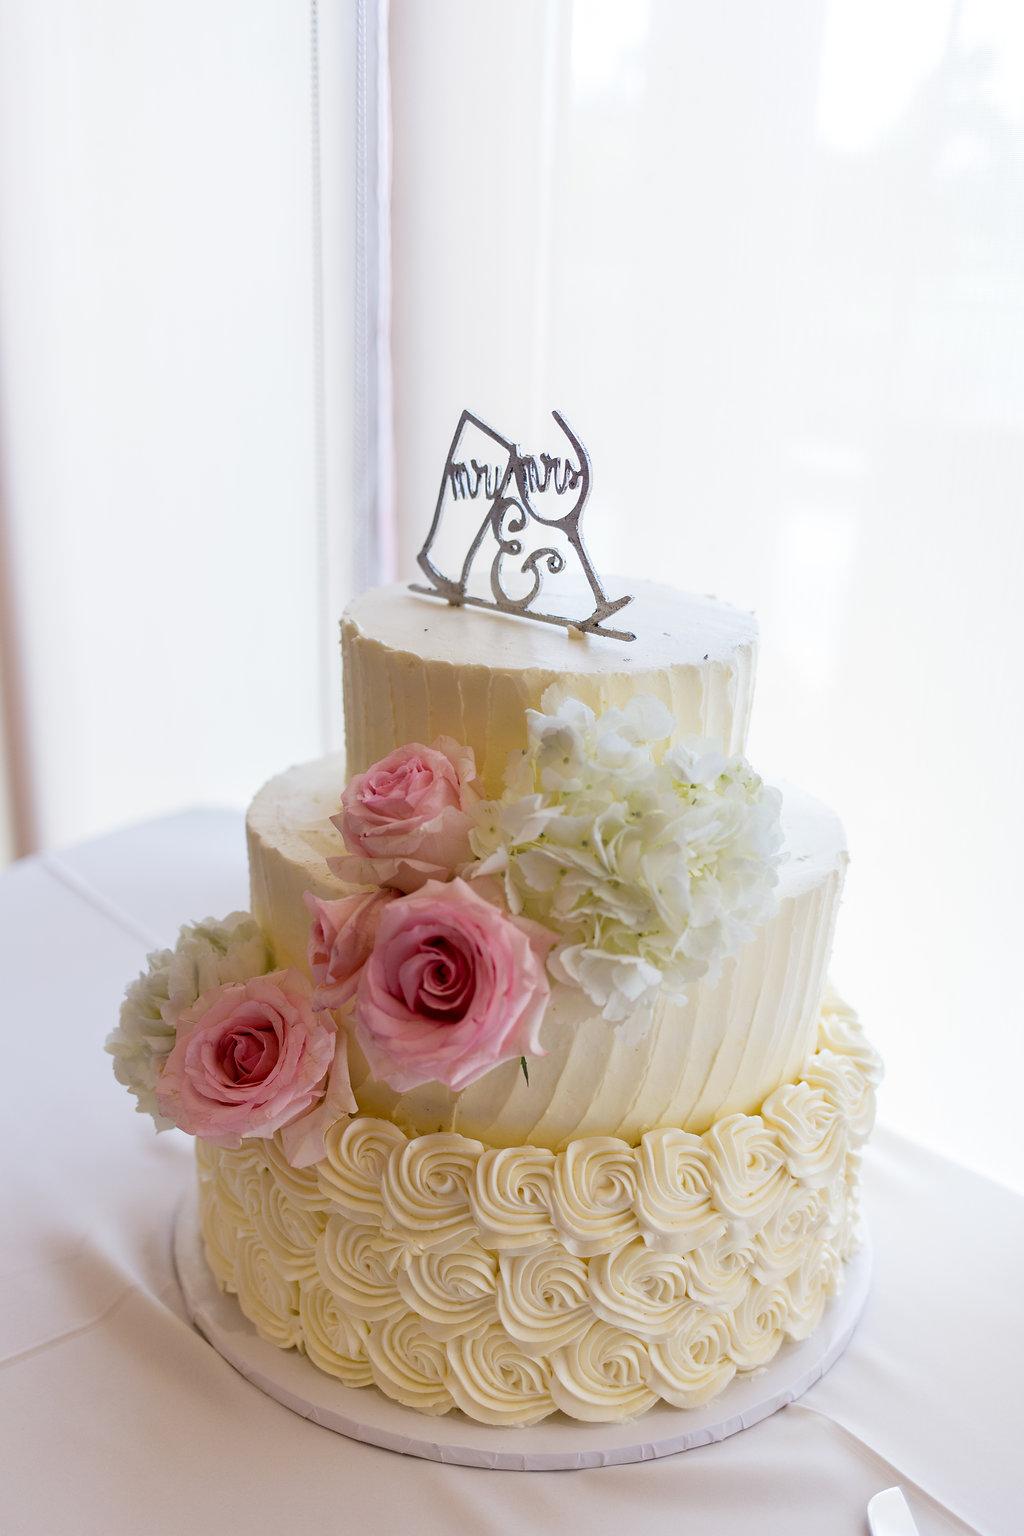 Simple White Wedding Cakes - Gorgeous Seal Beach Wedding Venue - Old Country Club Wedding